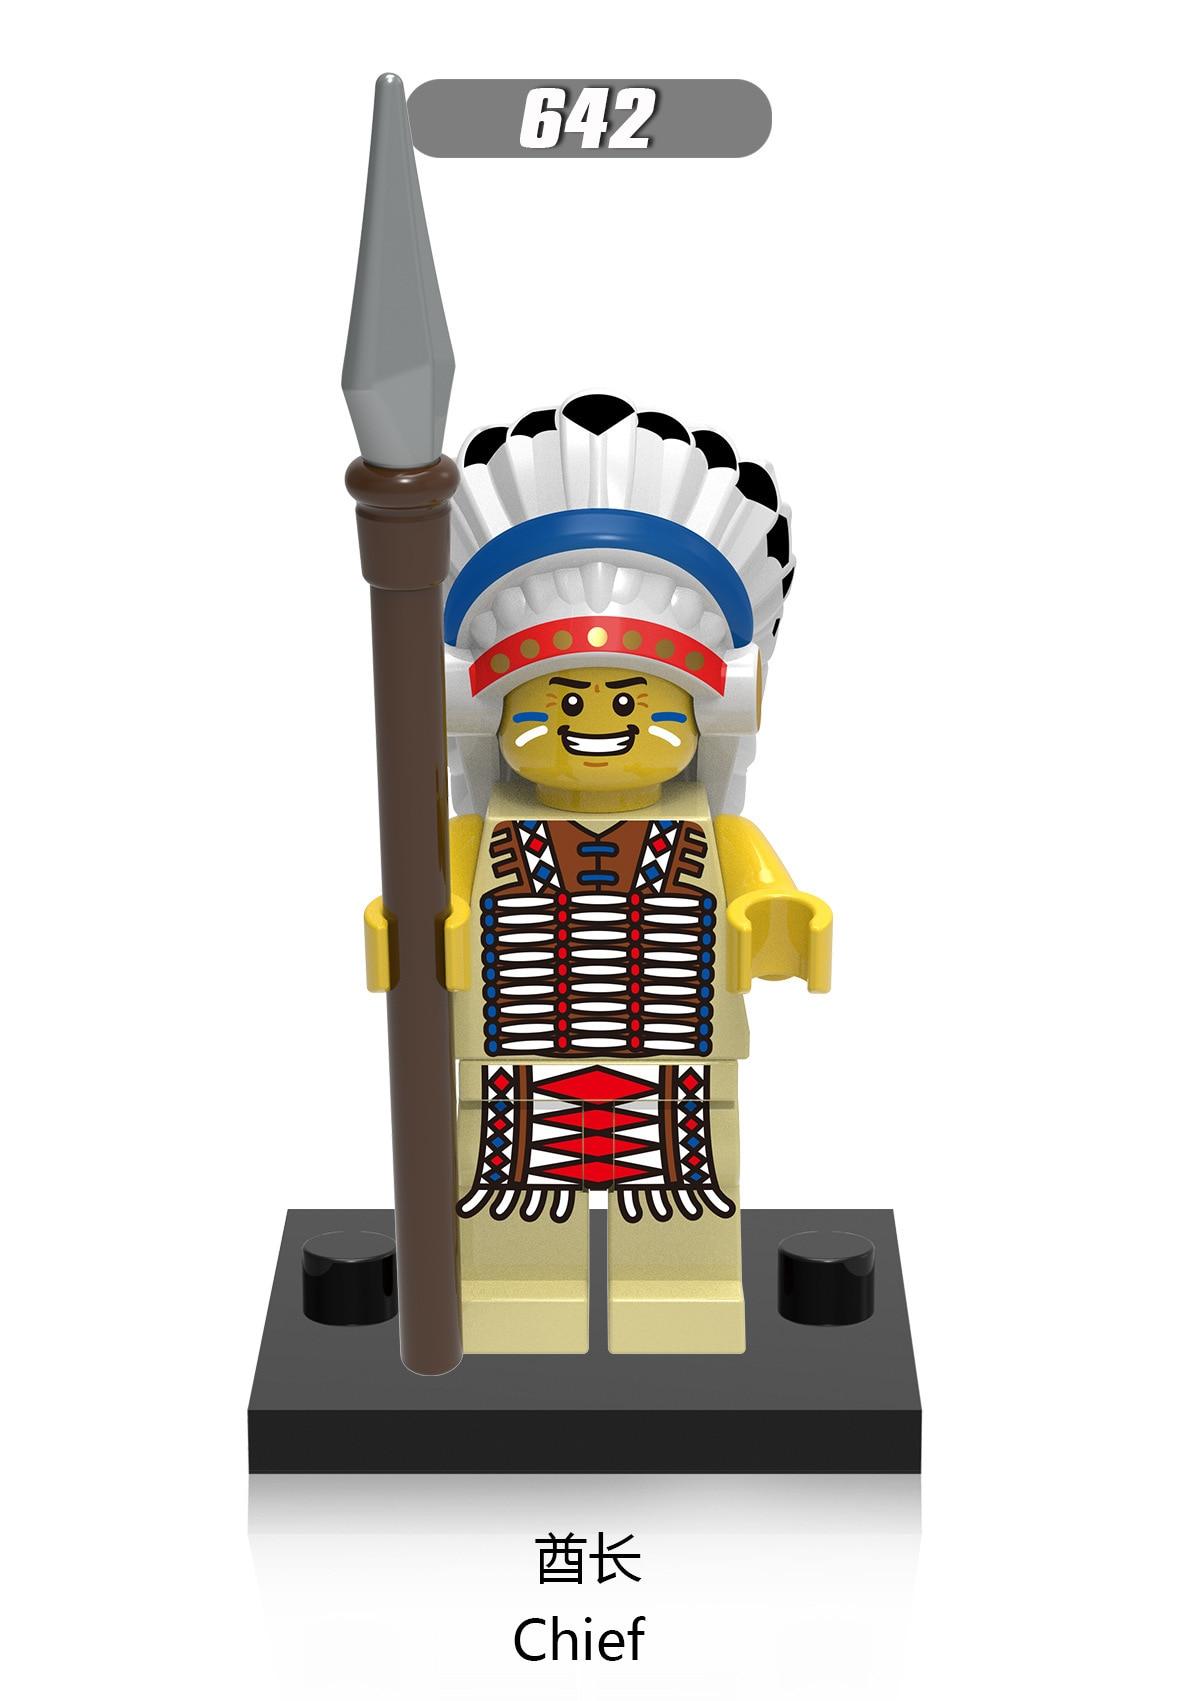 The Arrowhead Freemaker R0 Gr 805pcs Set Building Bricks Block Toy Lego 75186 Starwars Star Wars Compatible With